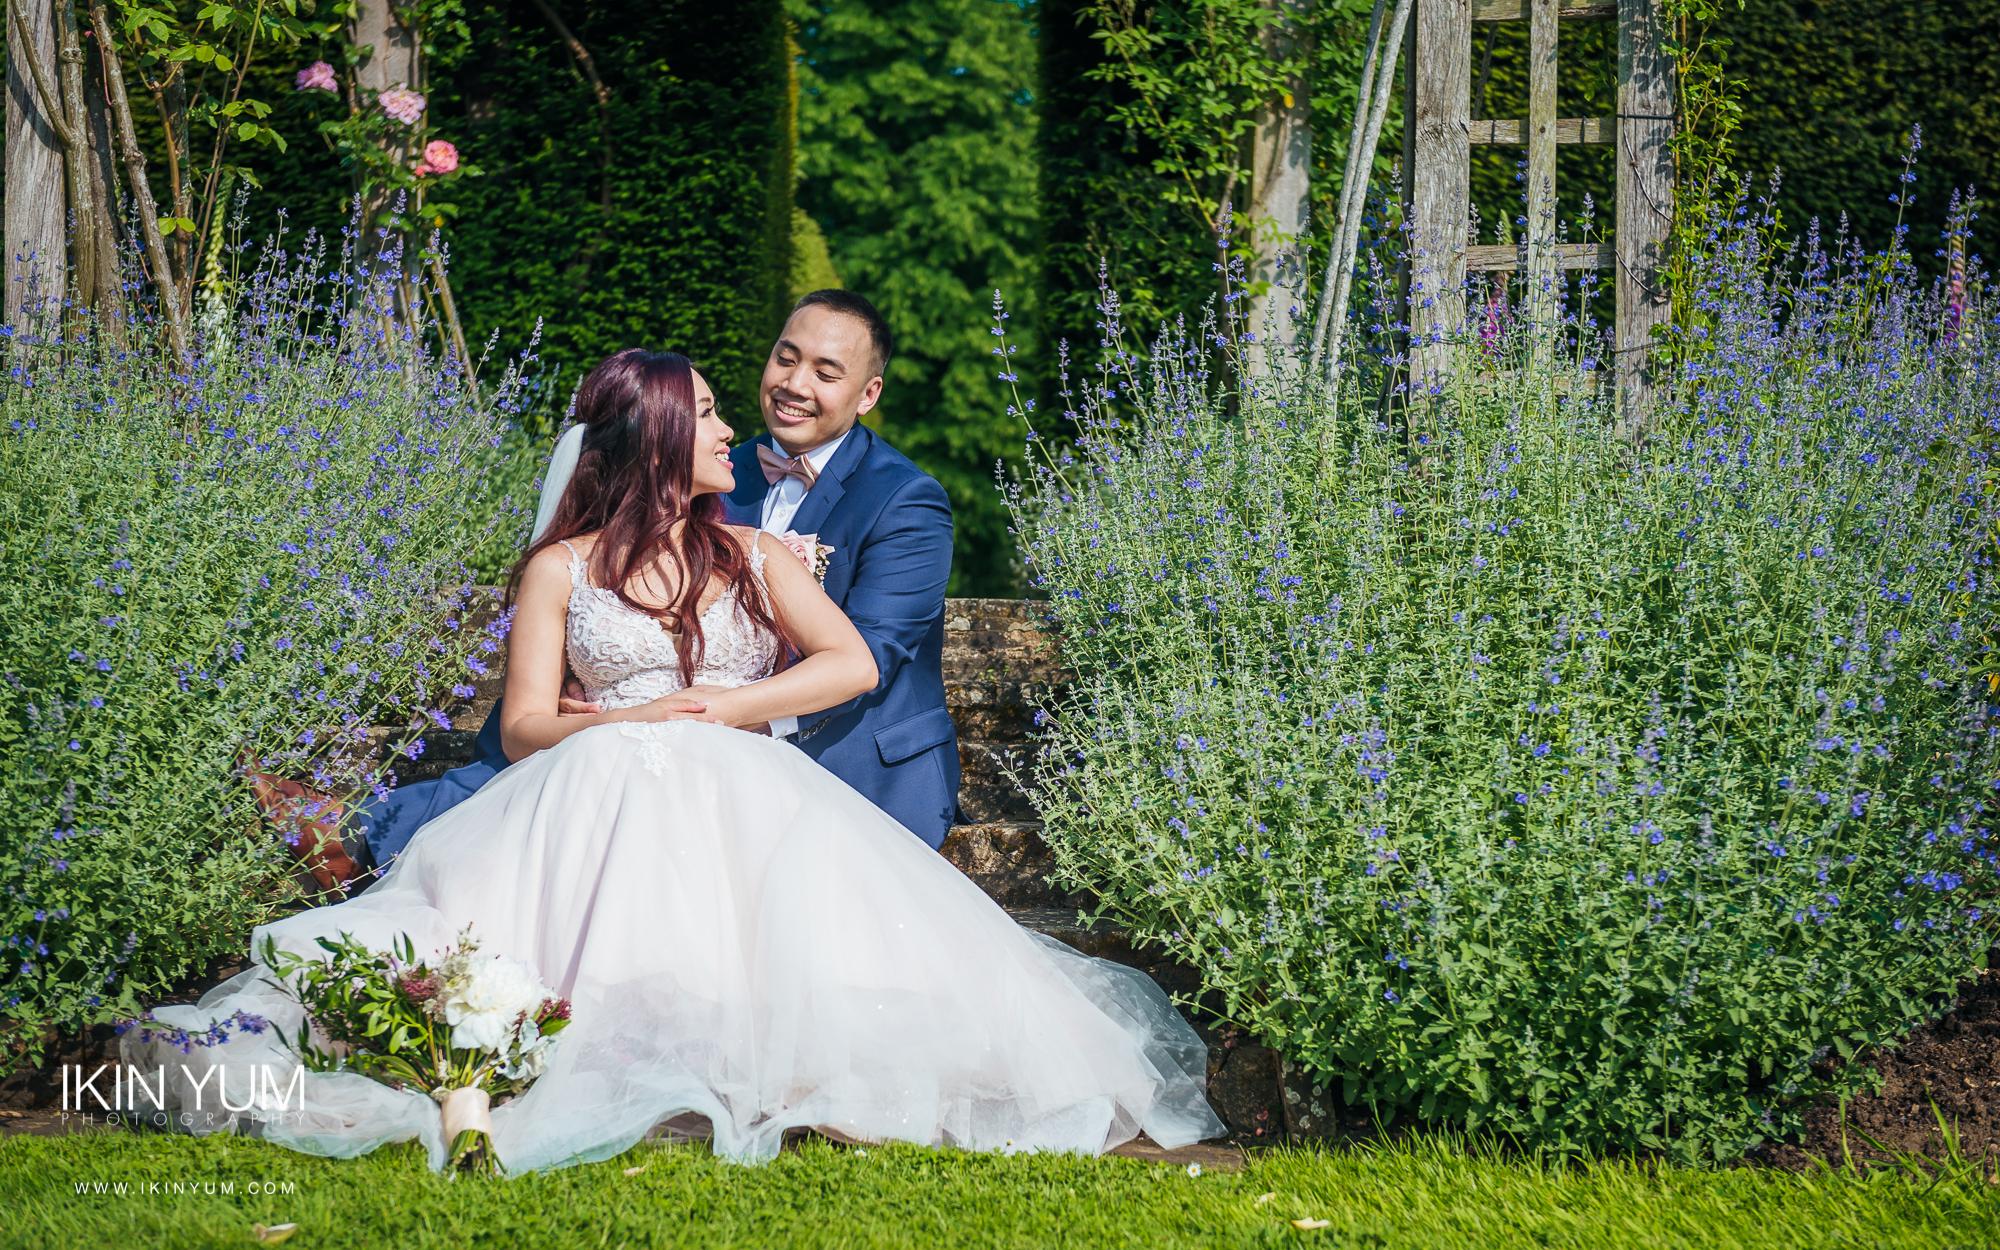 Sophia & David Wedding Day - Great Foster -  Ikin Yum Photography-120.jpg